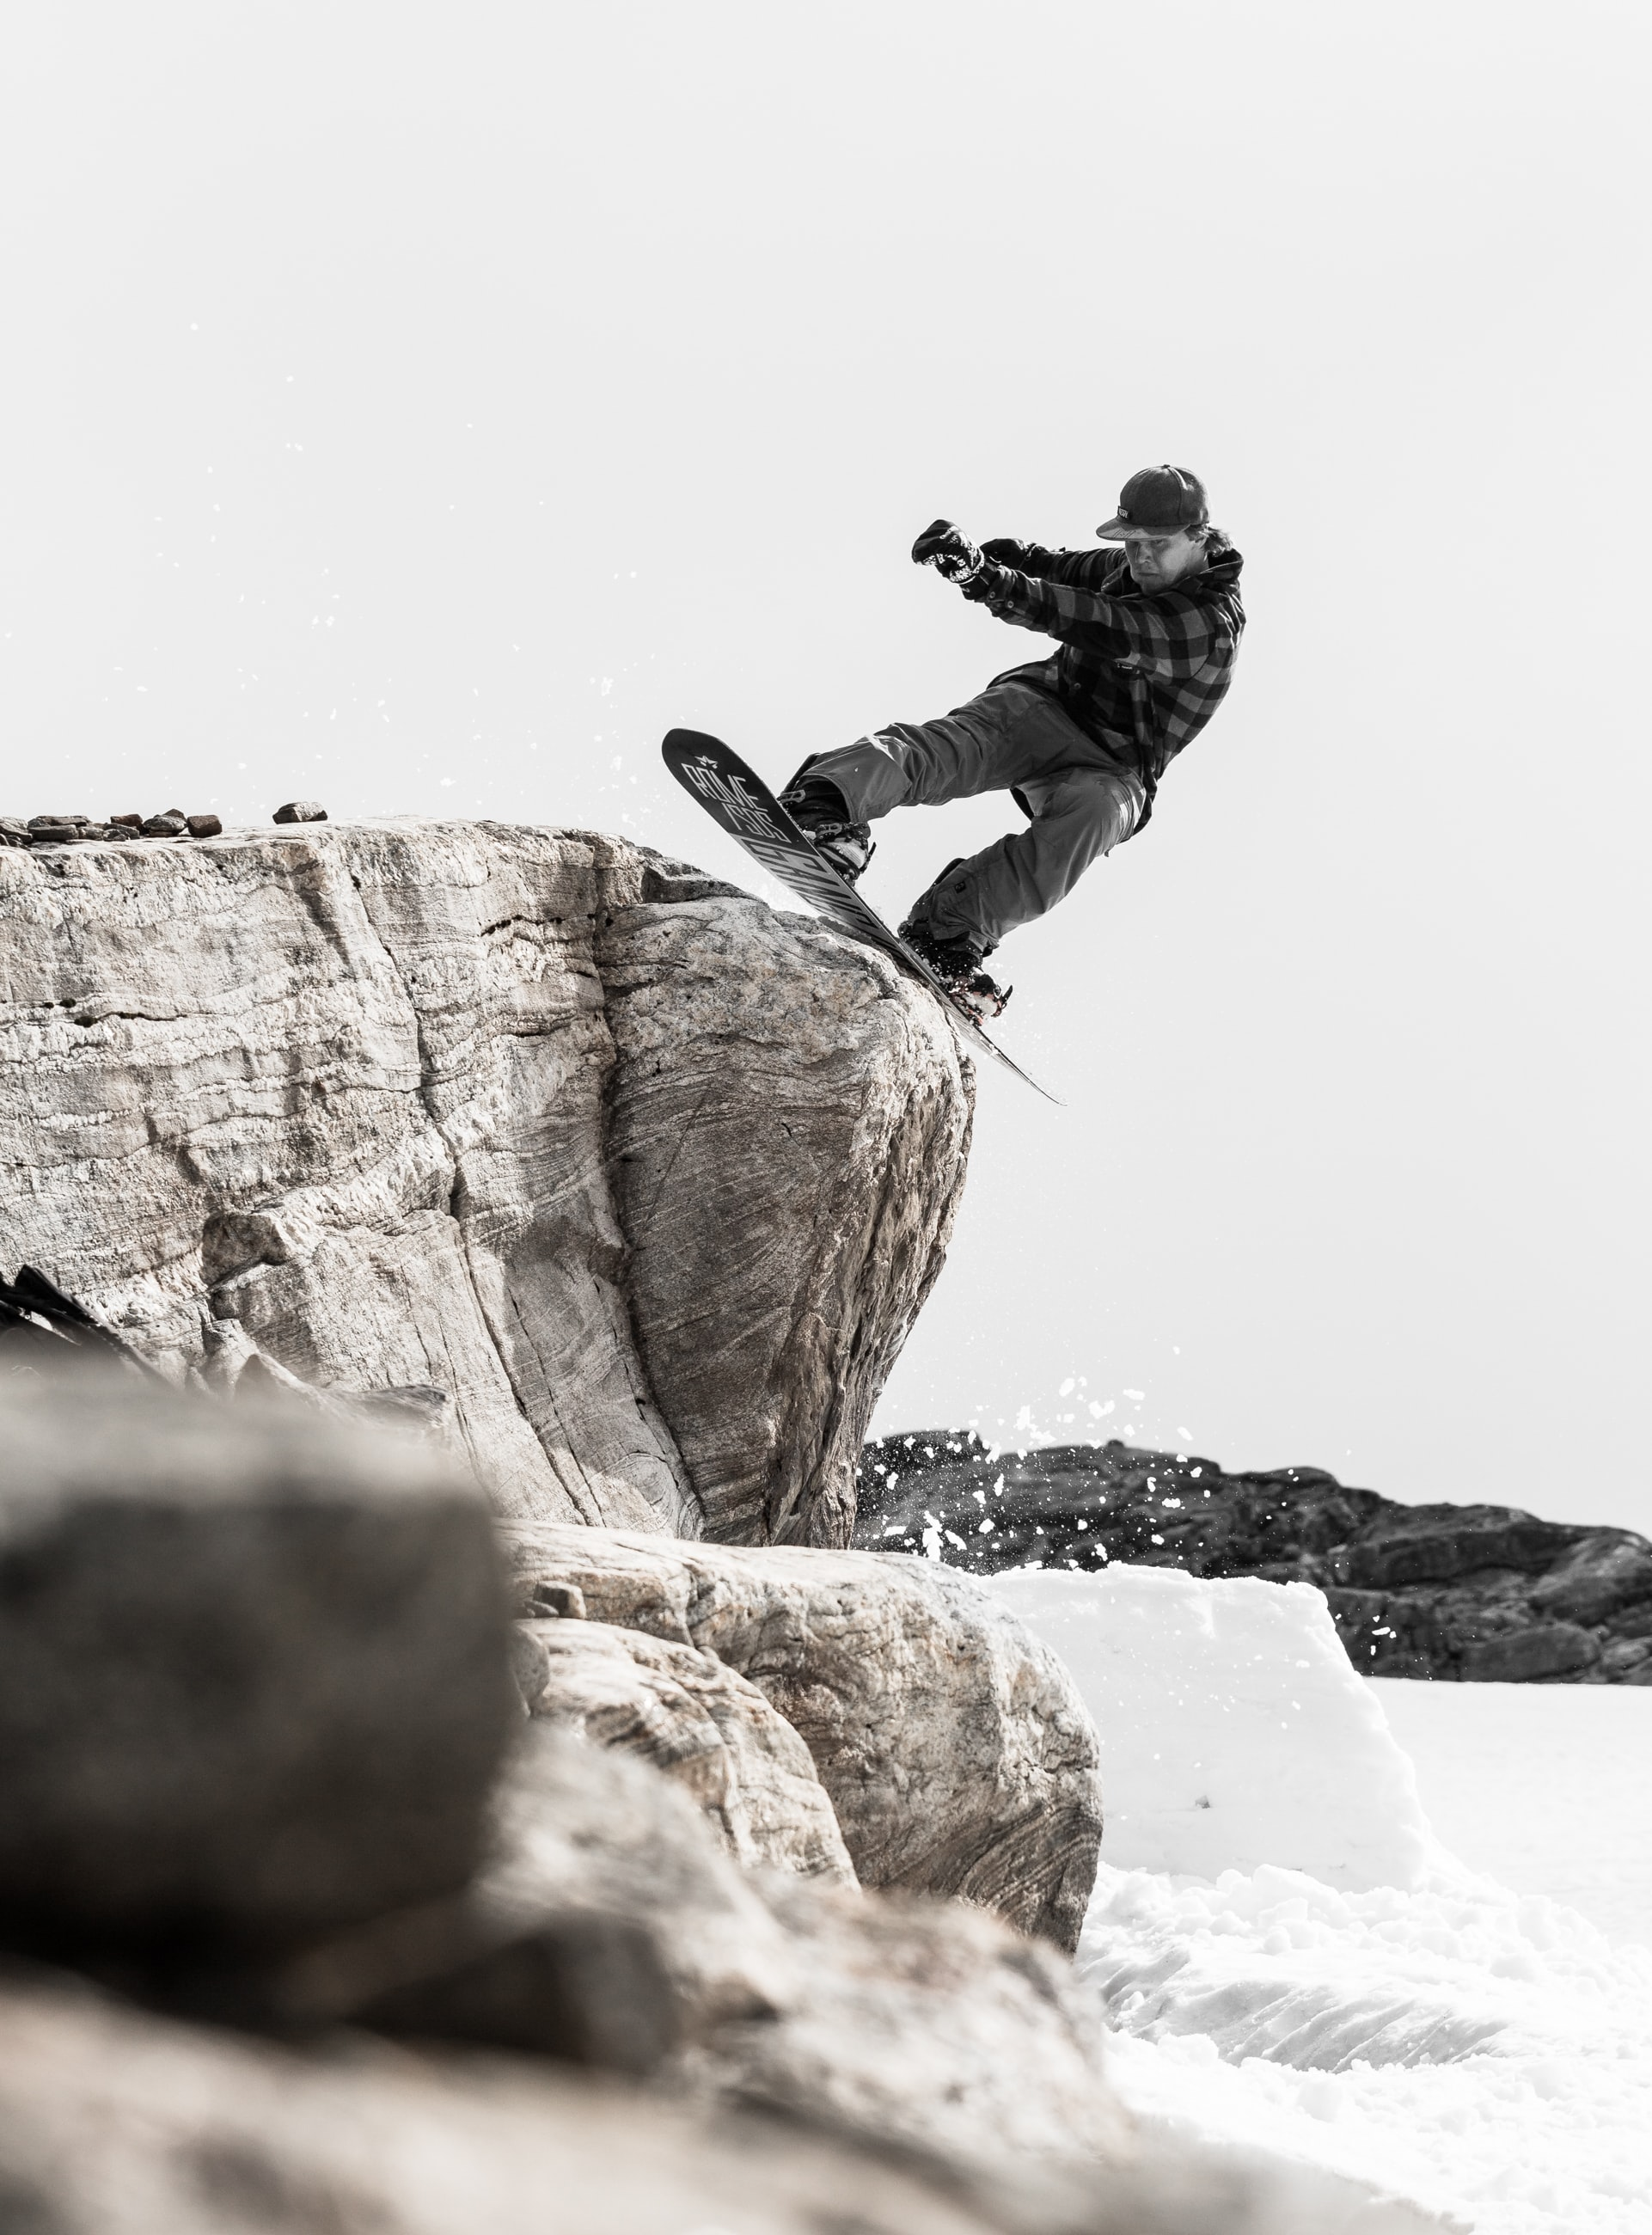 man doing tricks on snow board